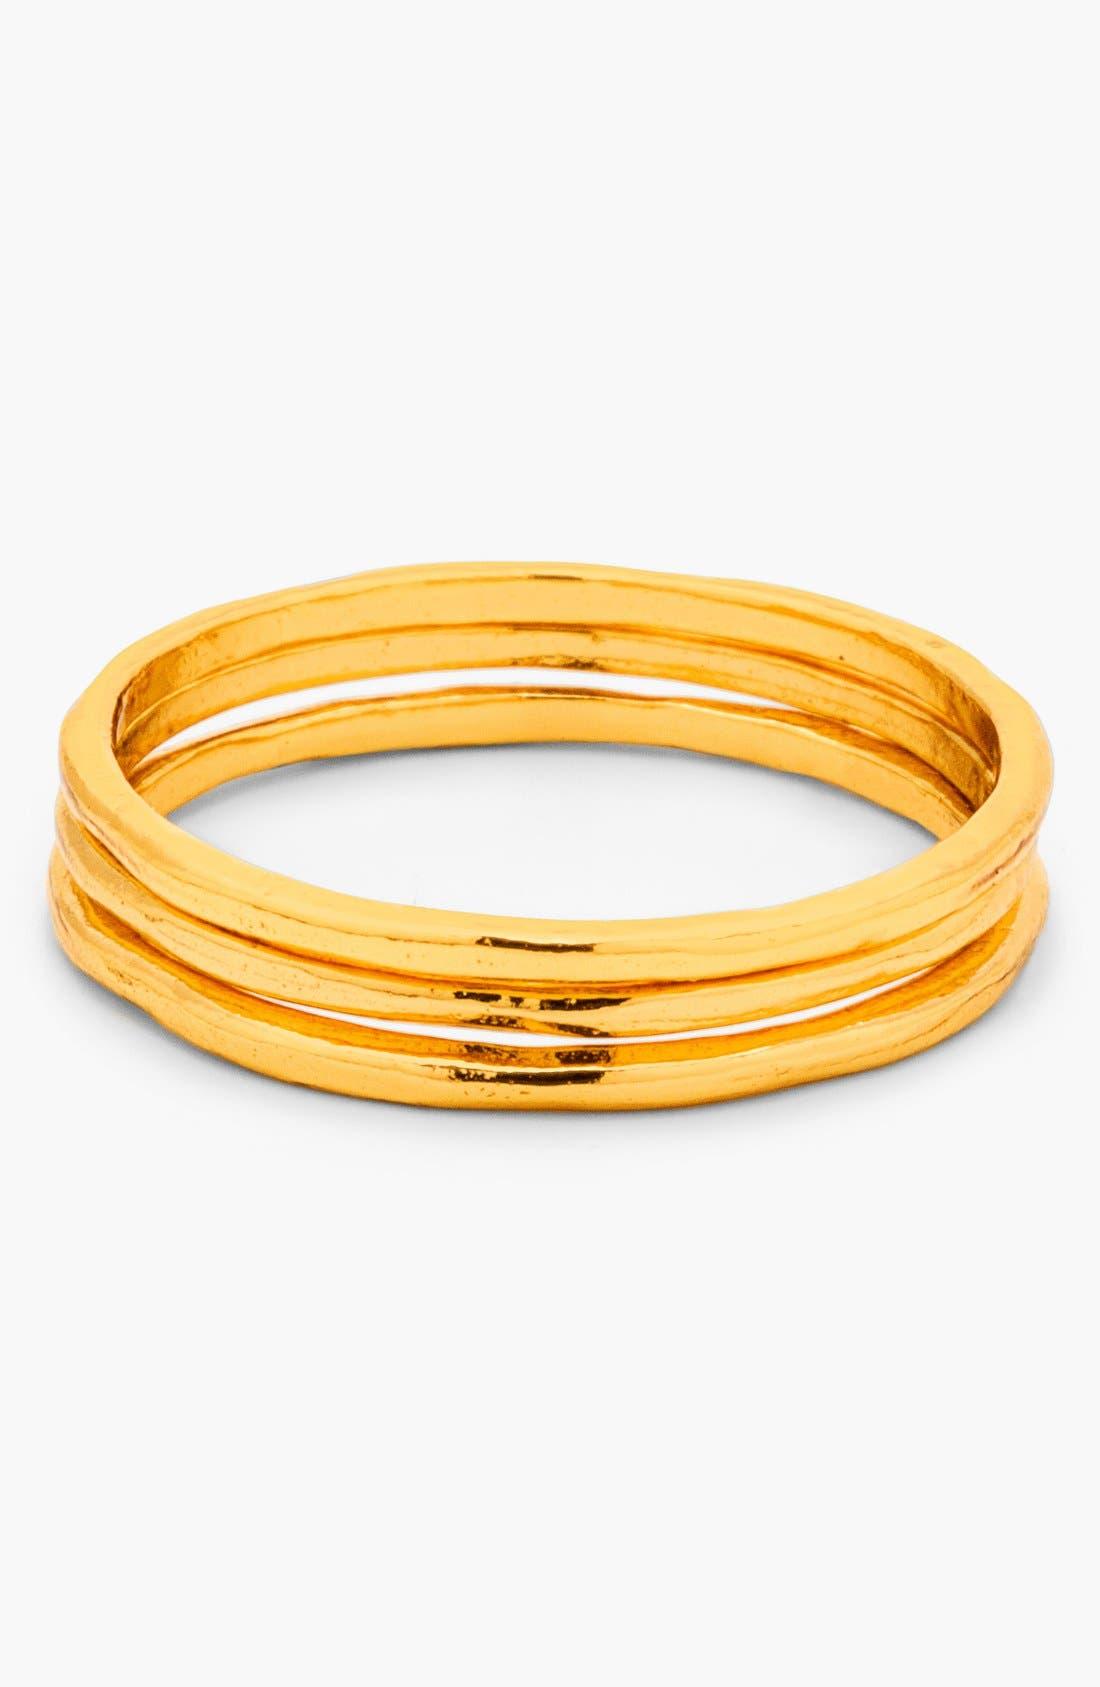 Main Image - gorjana 'G Ring' Midi Rings (Set of 3)